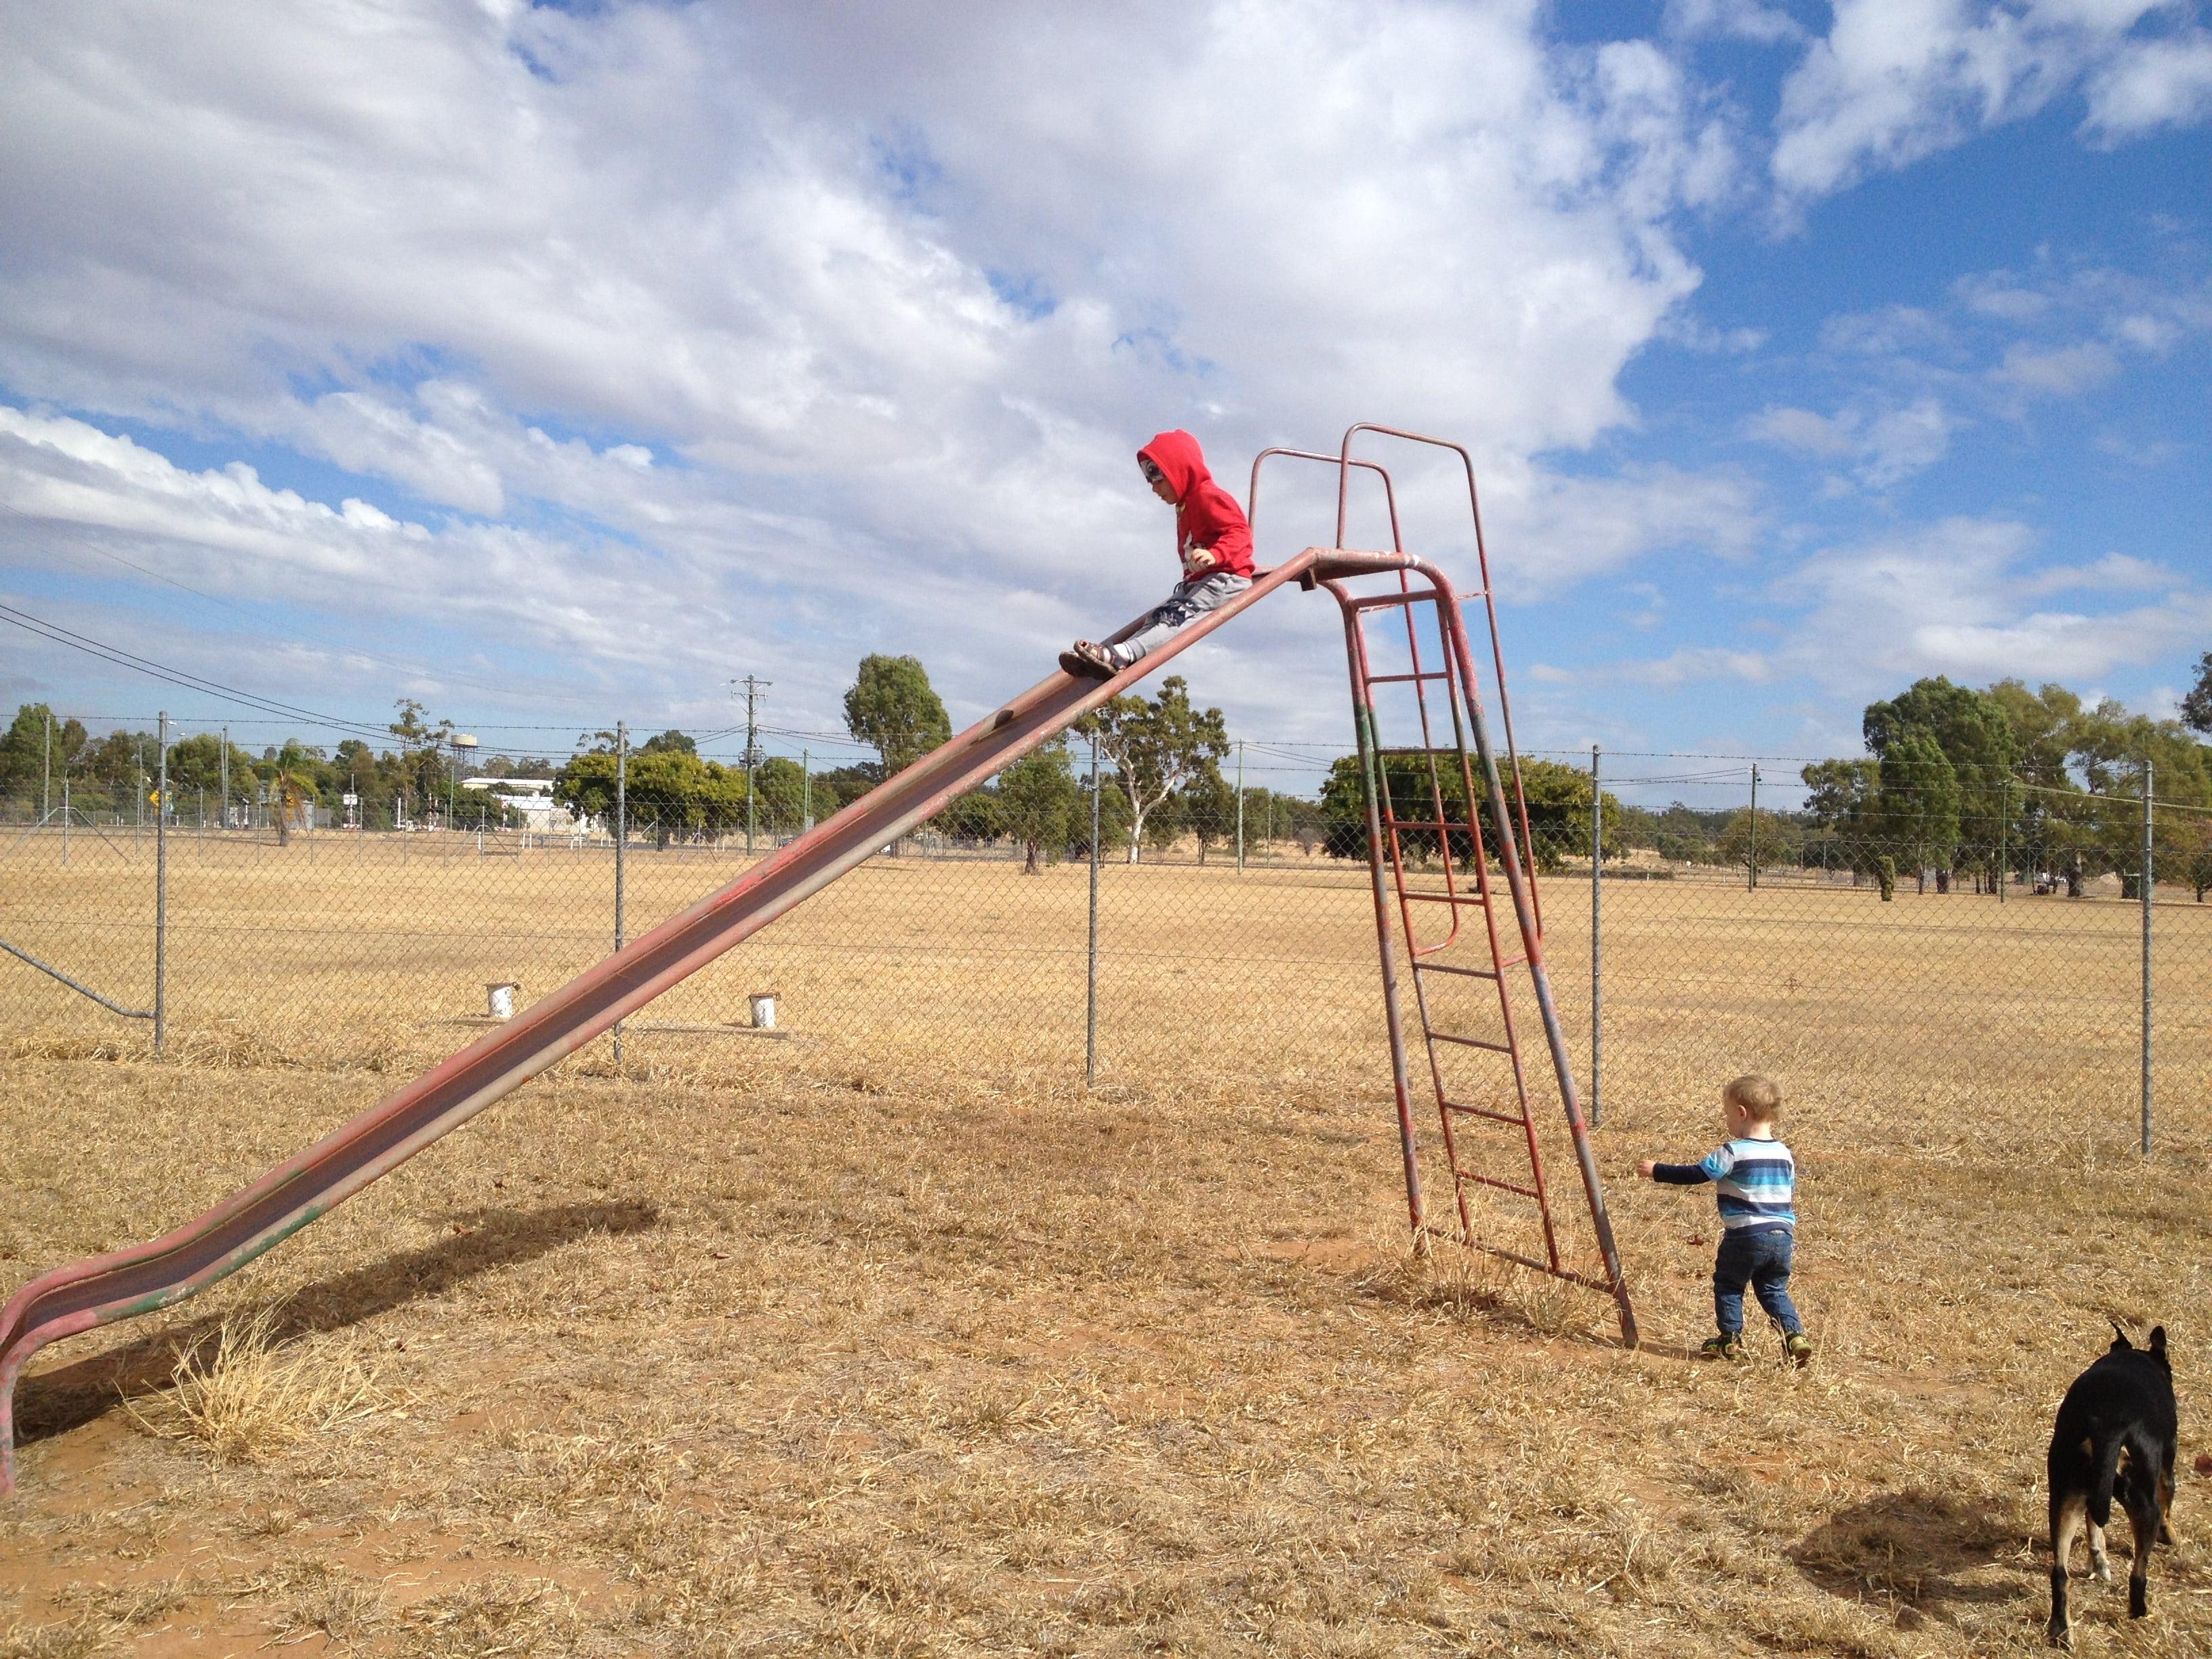 An old school playground in Australia